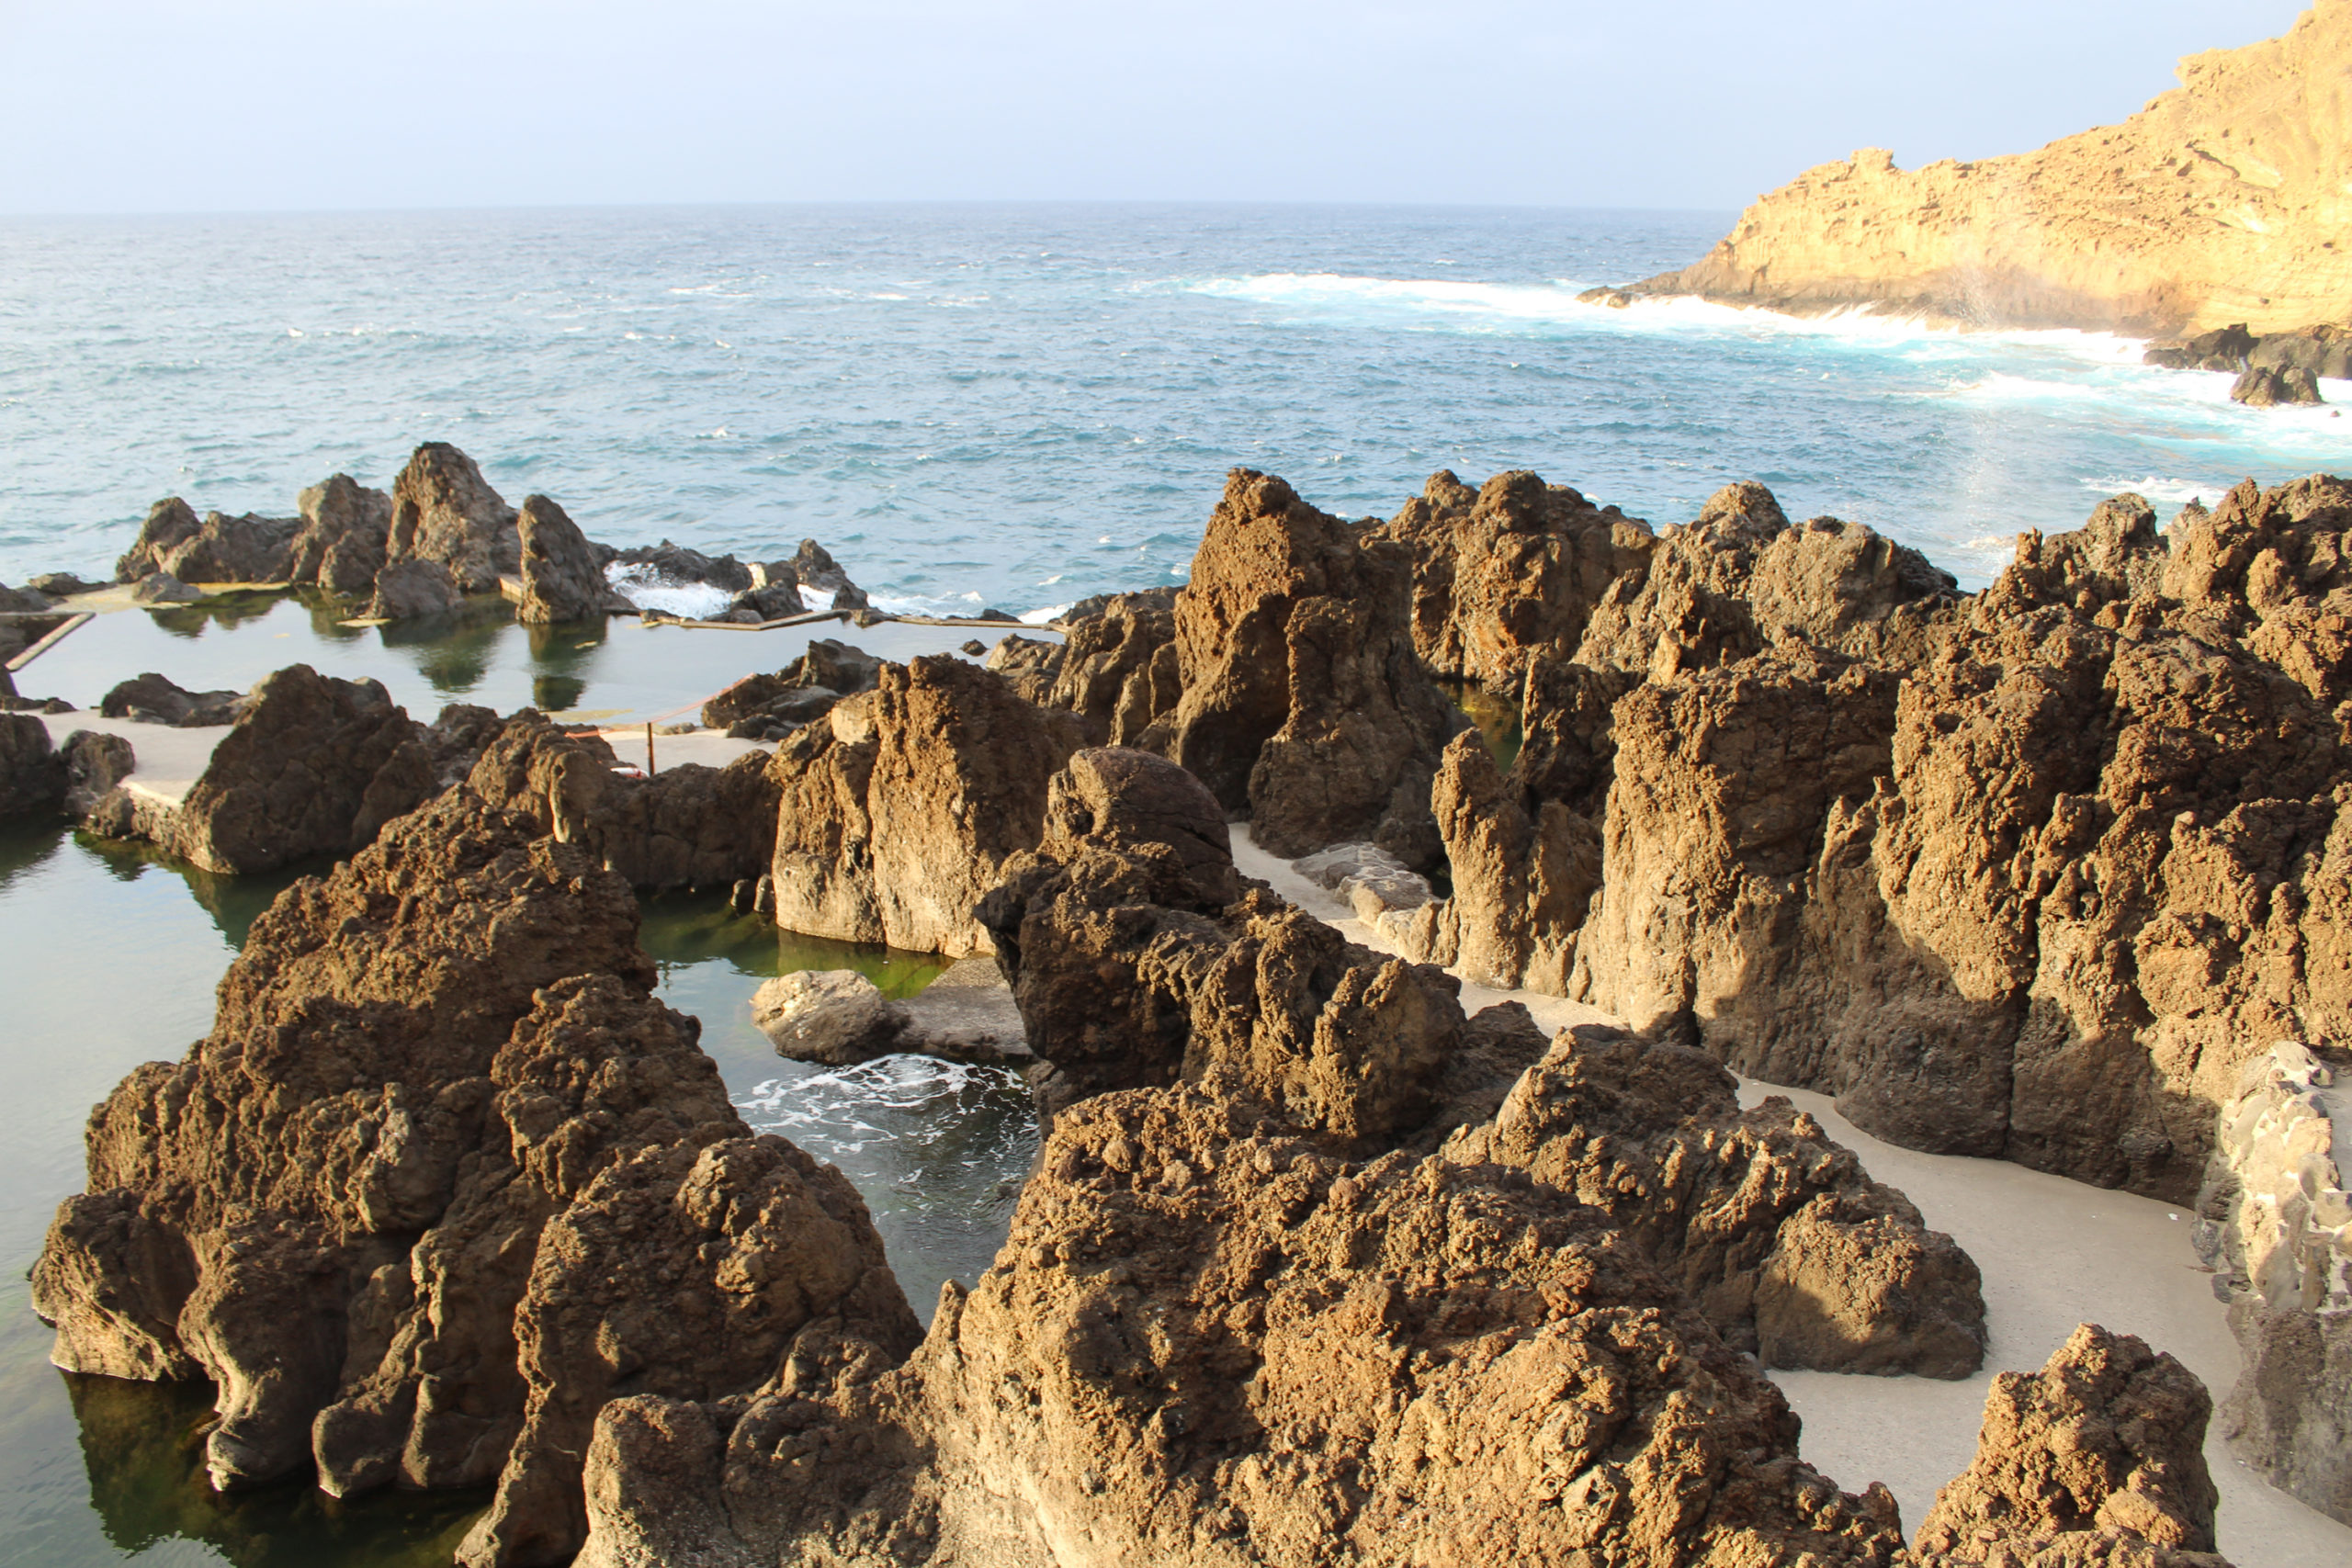 madera widok na zatokę i skały